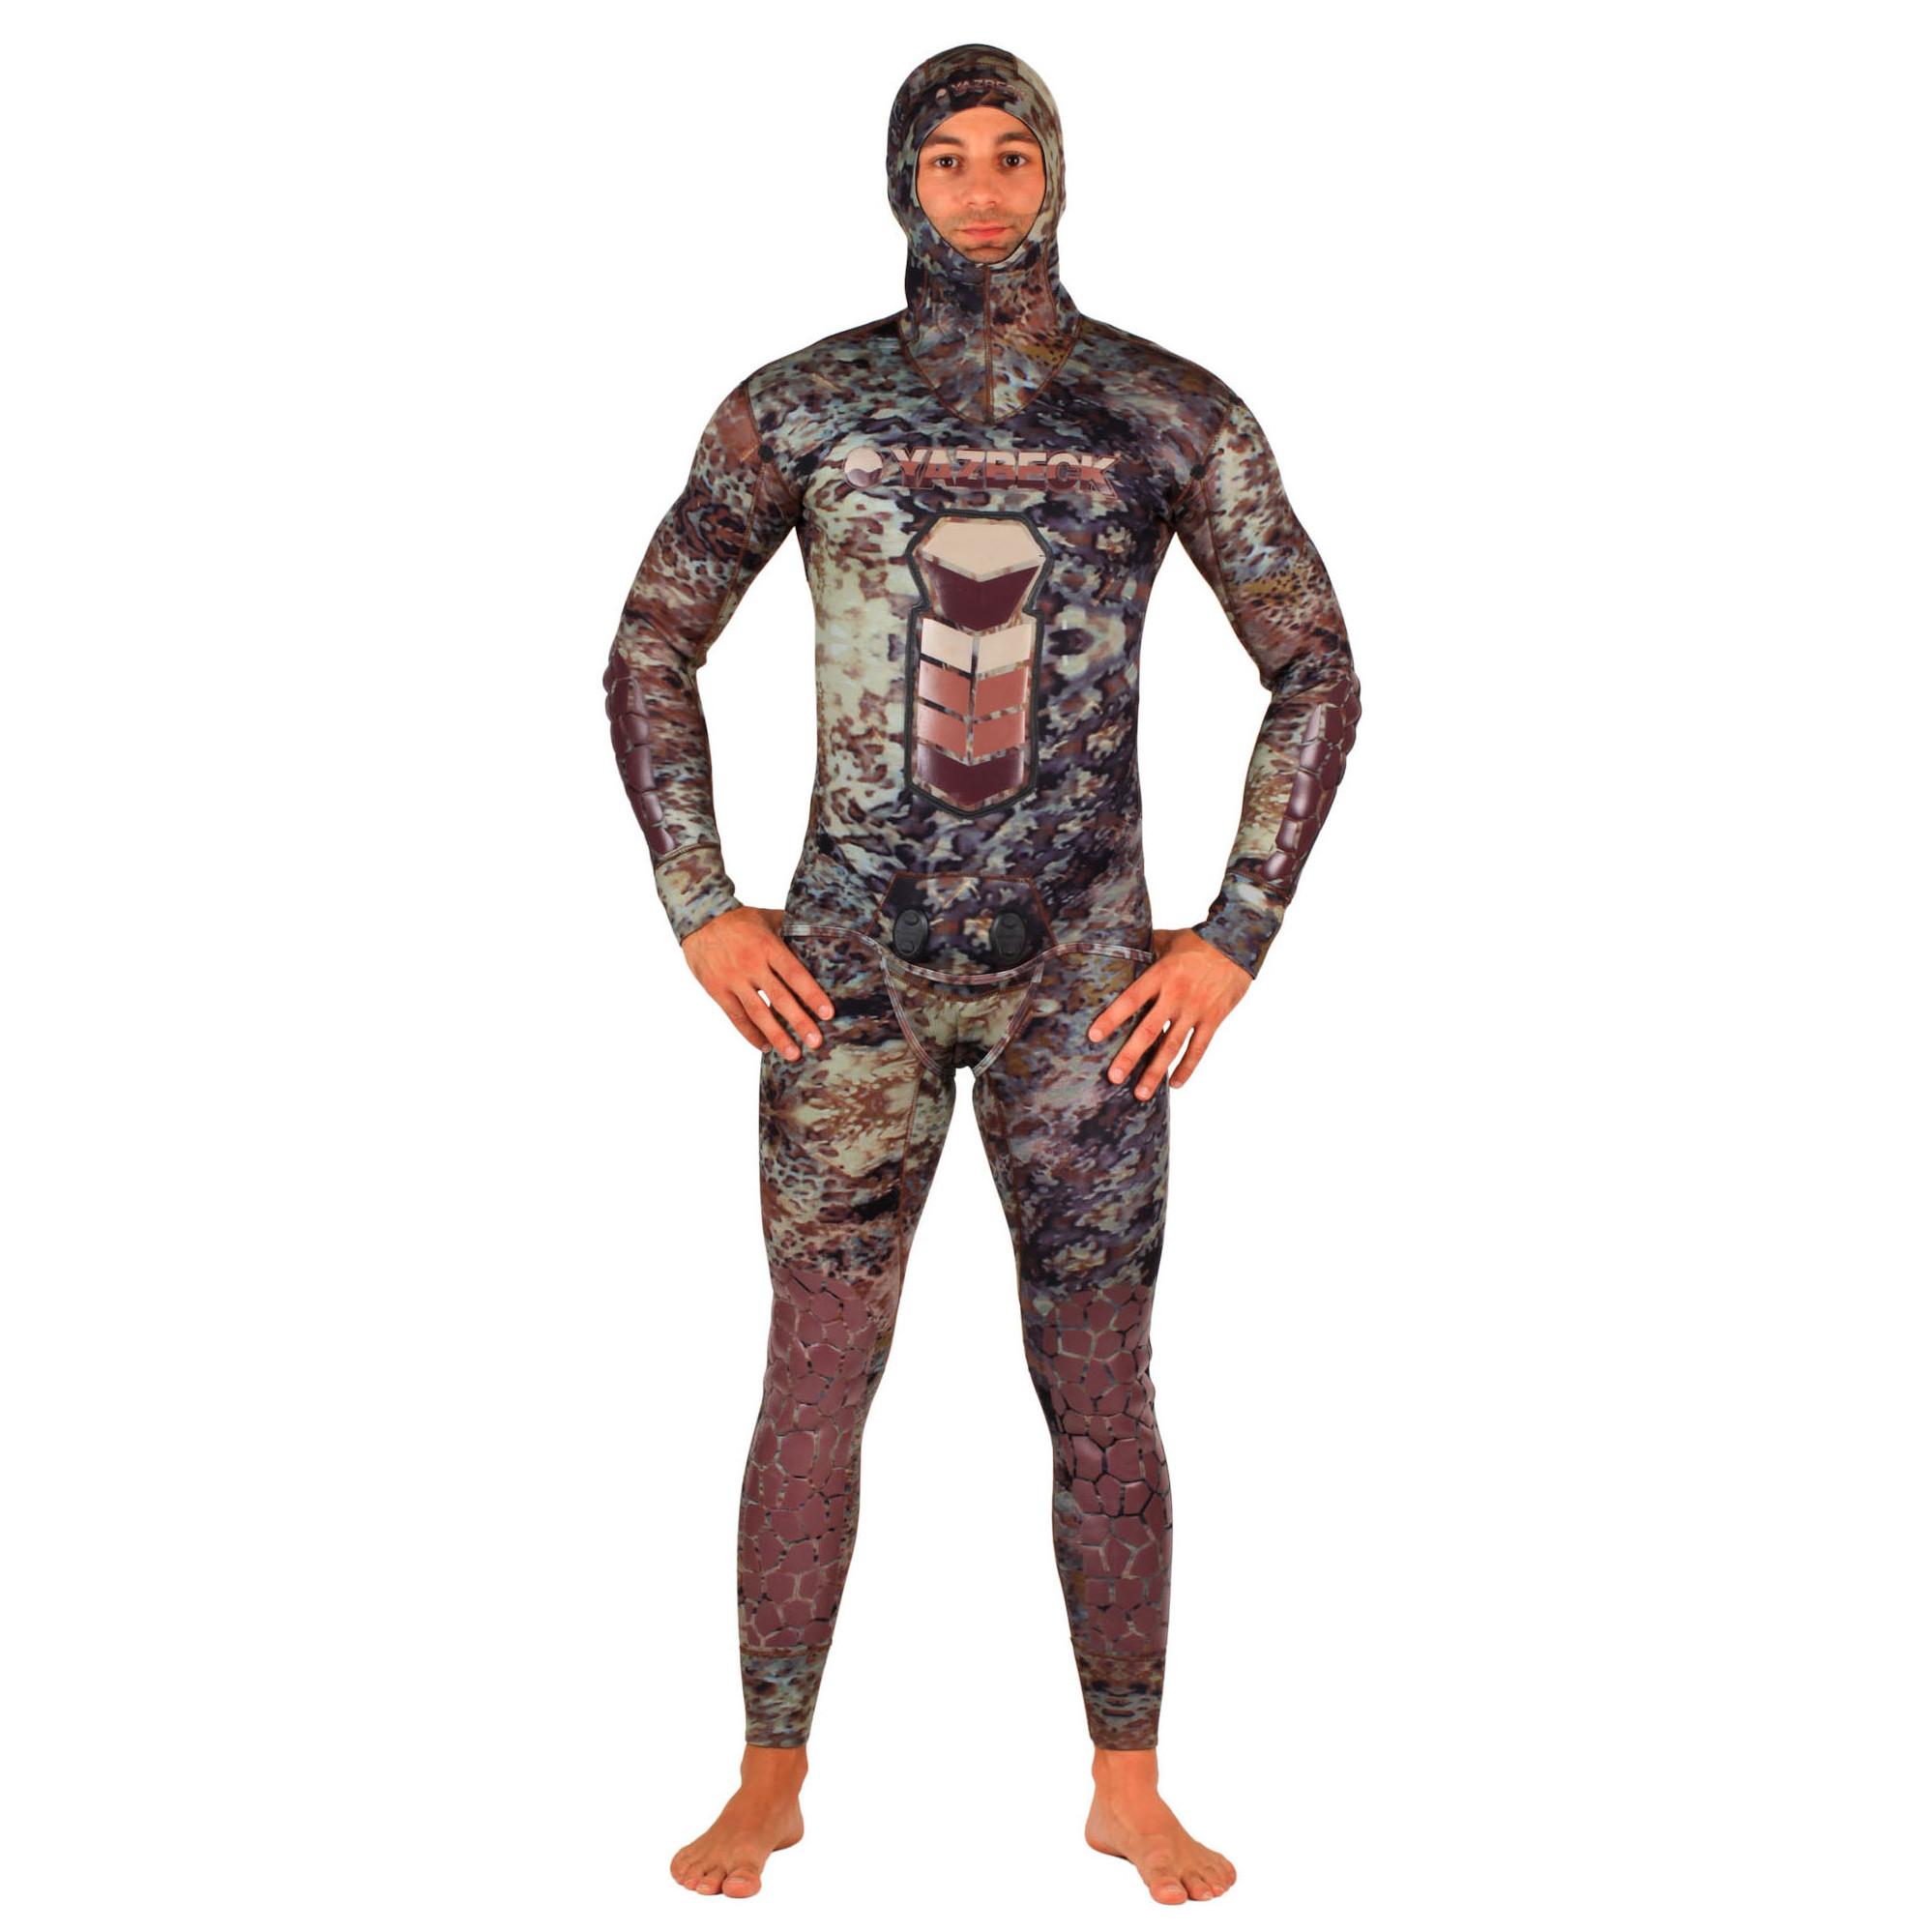 Yazbeck-Hamour-Scorpionfish-Wetsuit-1.5mm-3.5mm-5.5mm-7.5mm-Open-Cell-Titanium-Spearfishing